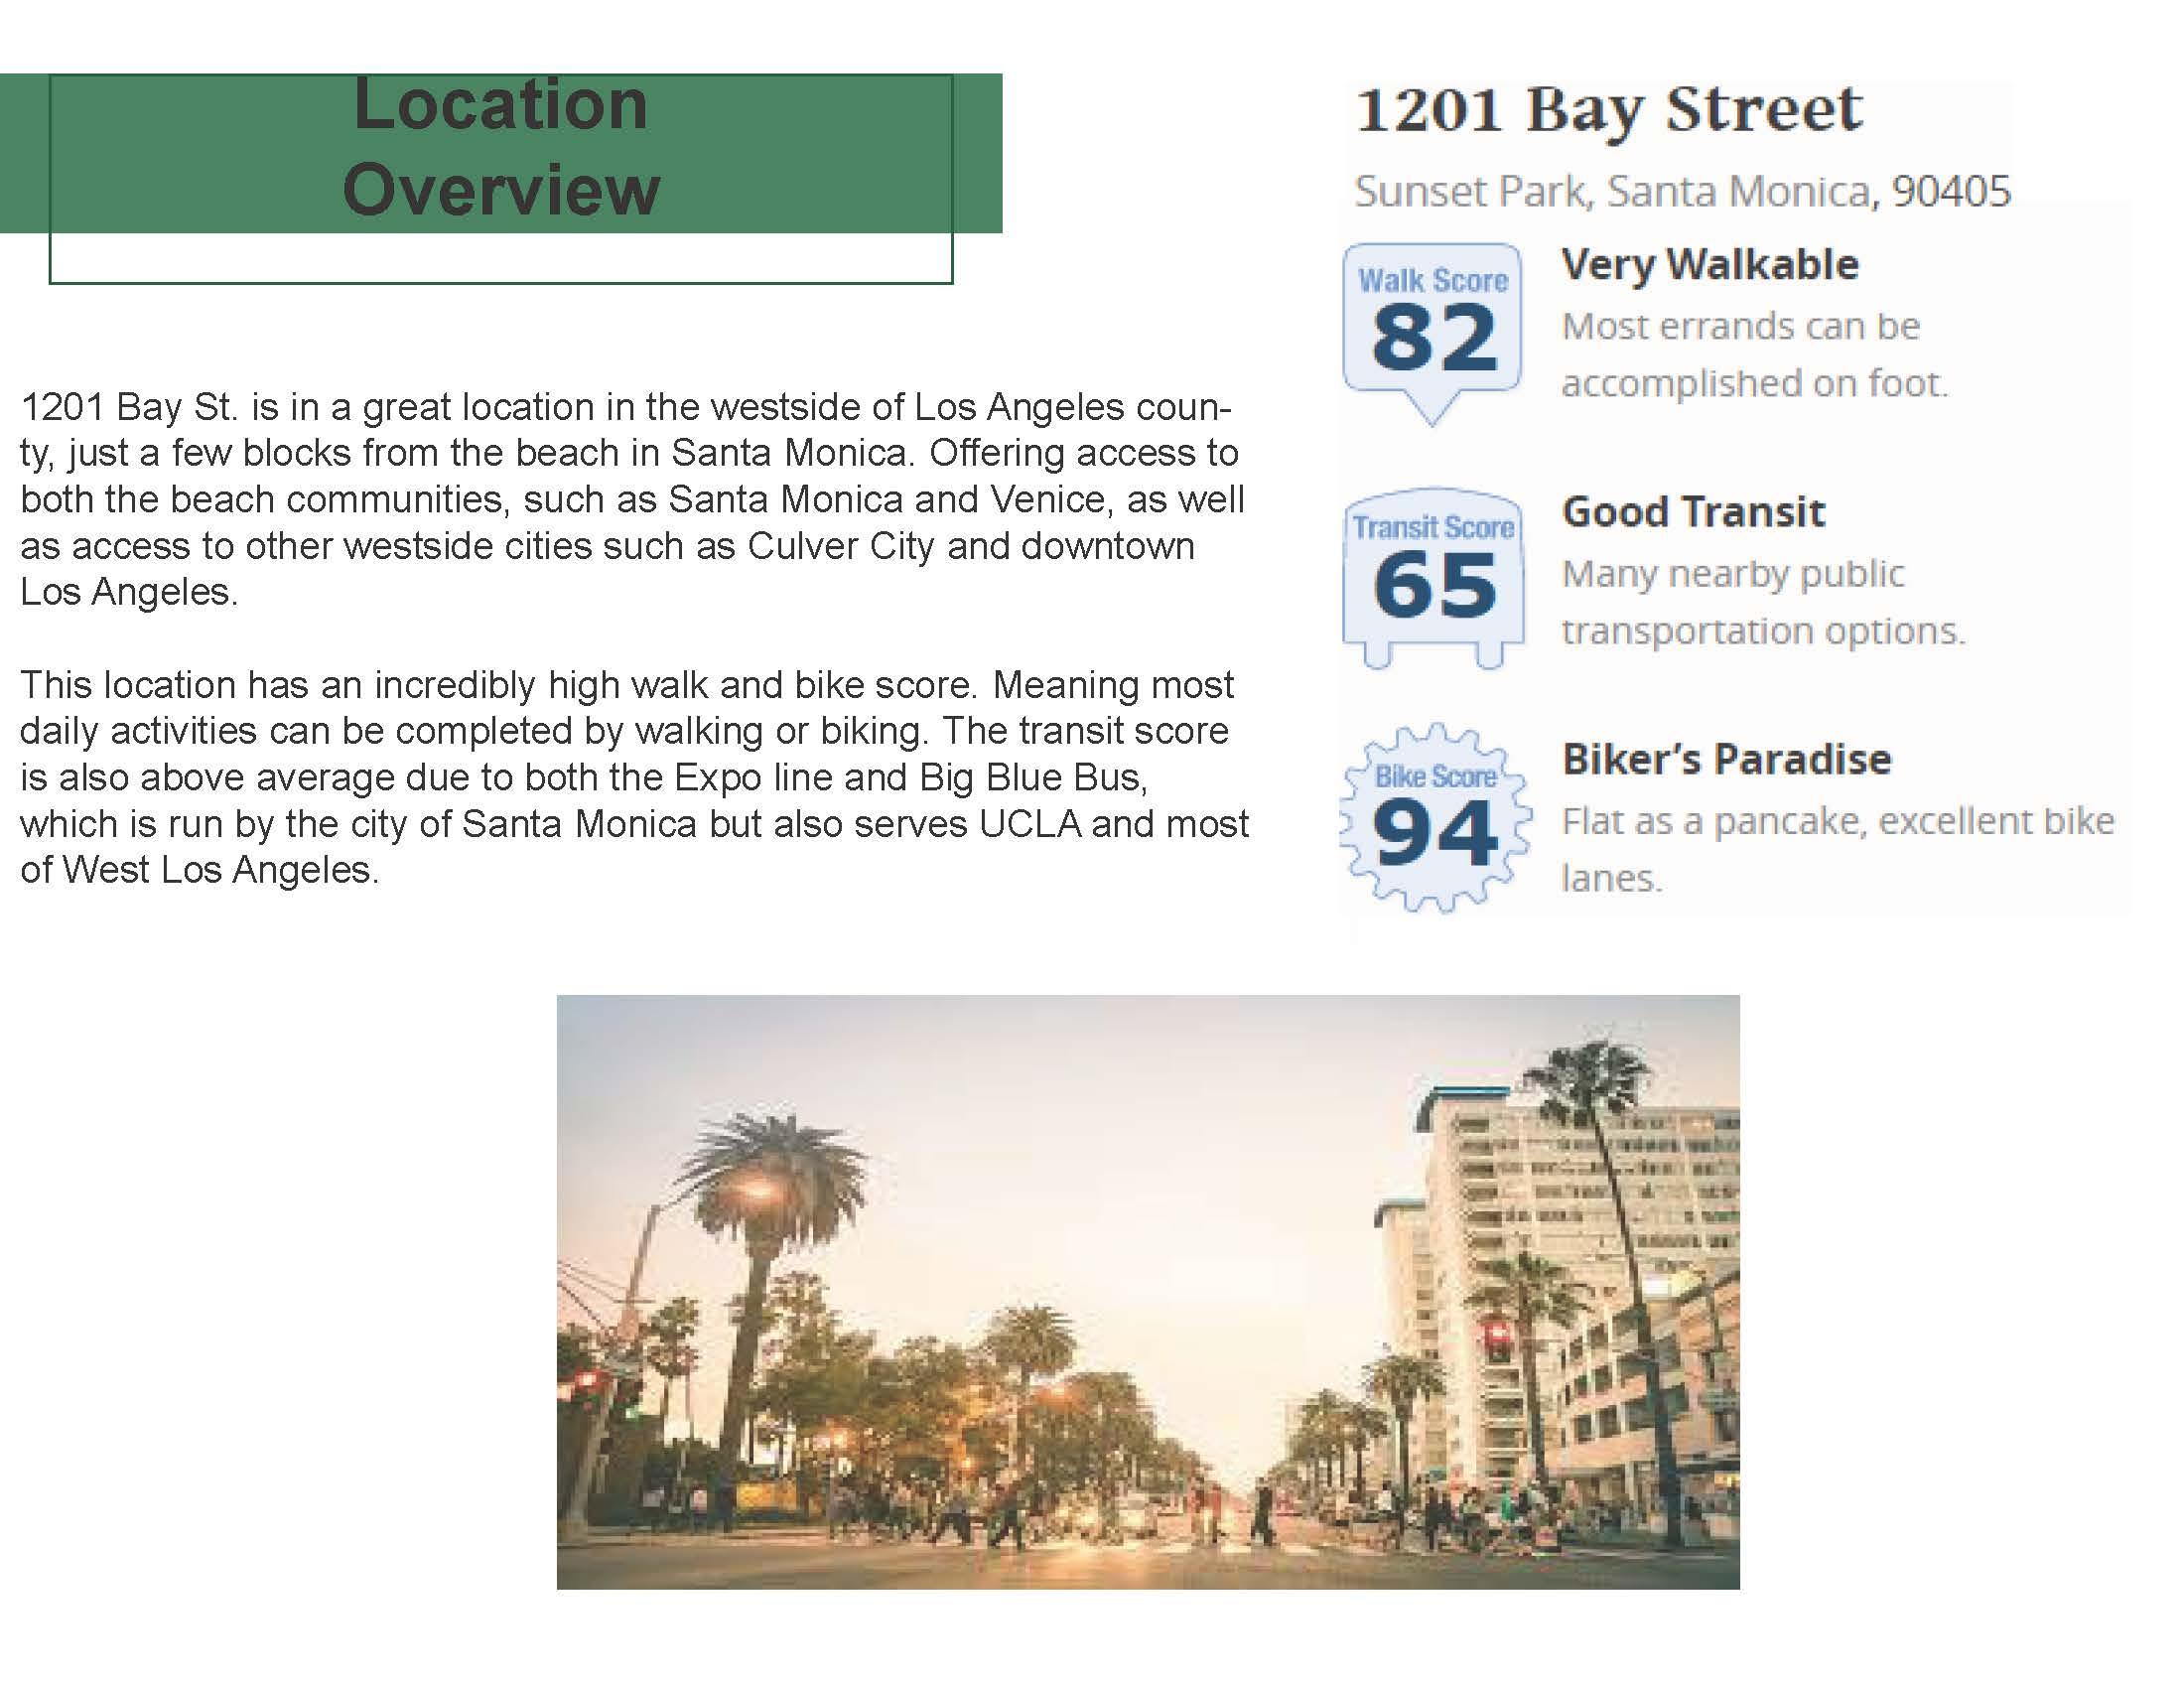 1201-Bay-St-Marketing-Brochure-PDF_Page_6.jpg